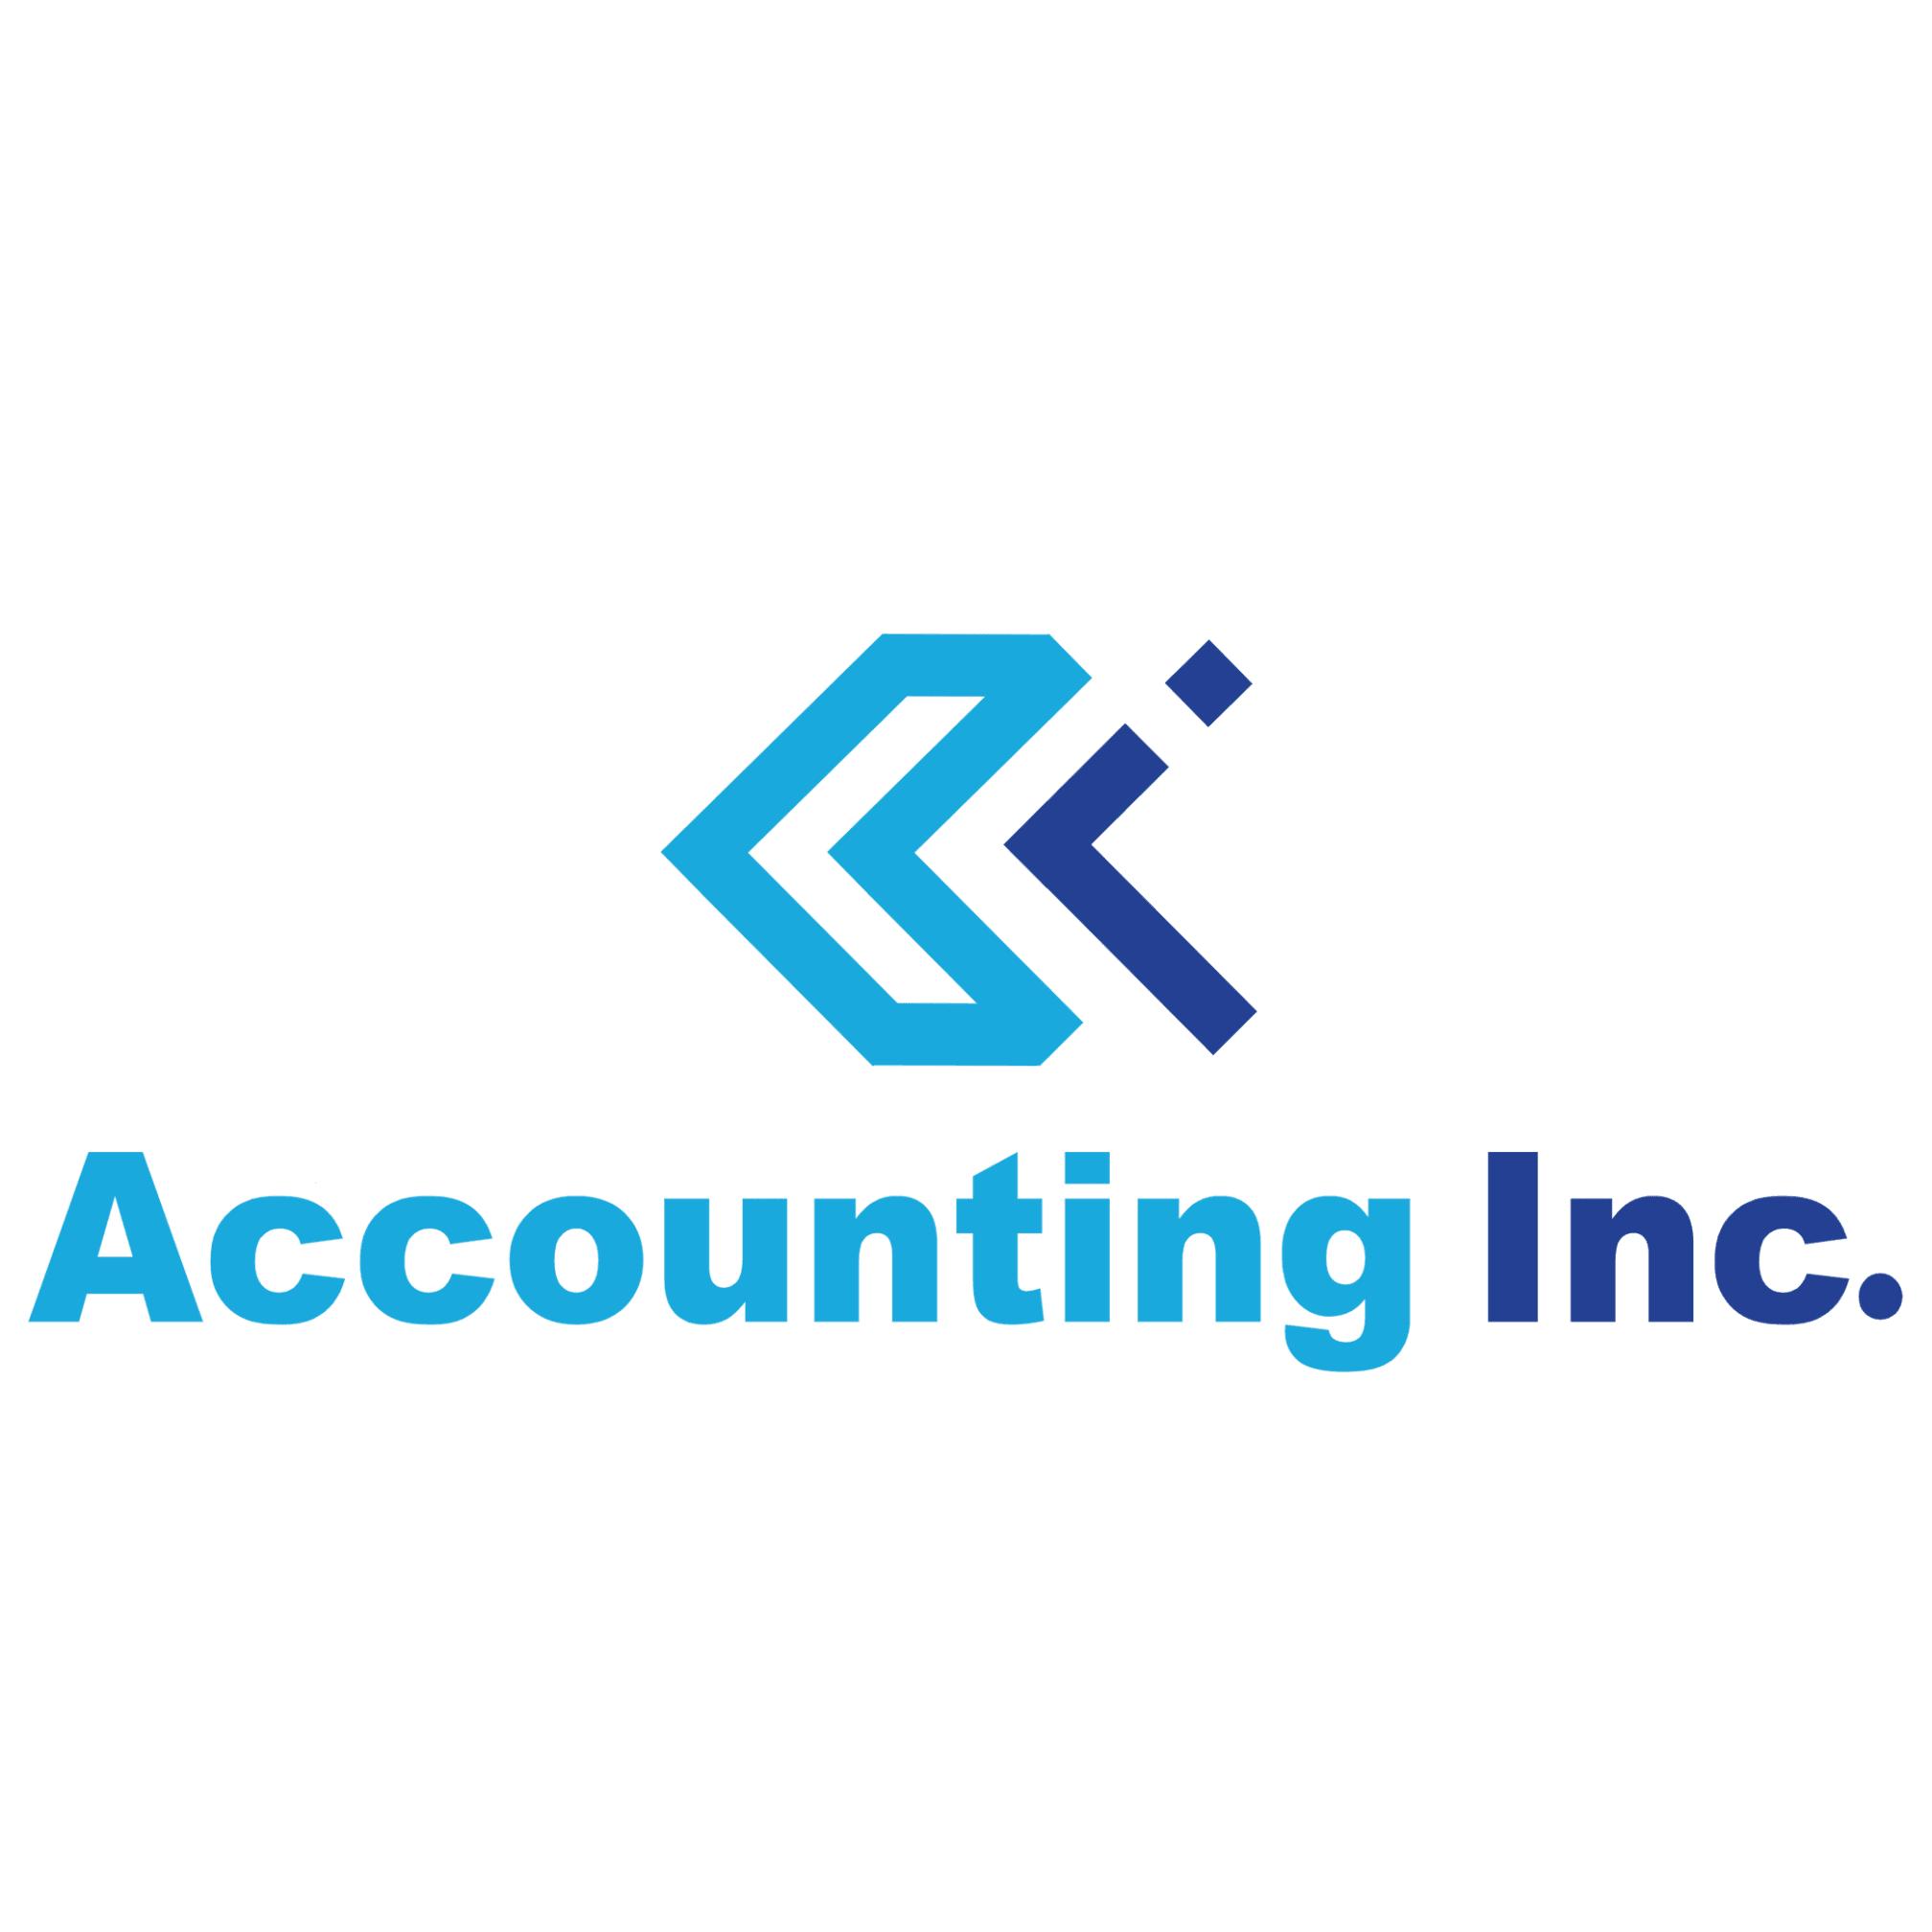 Accounting Inc. - Gateshead, Tyne and Wear NE11 9DJ - 01914 937054 | ShowMeLocal.com